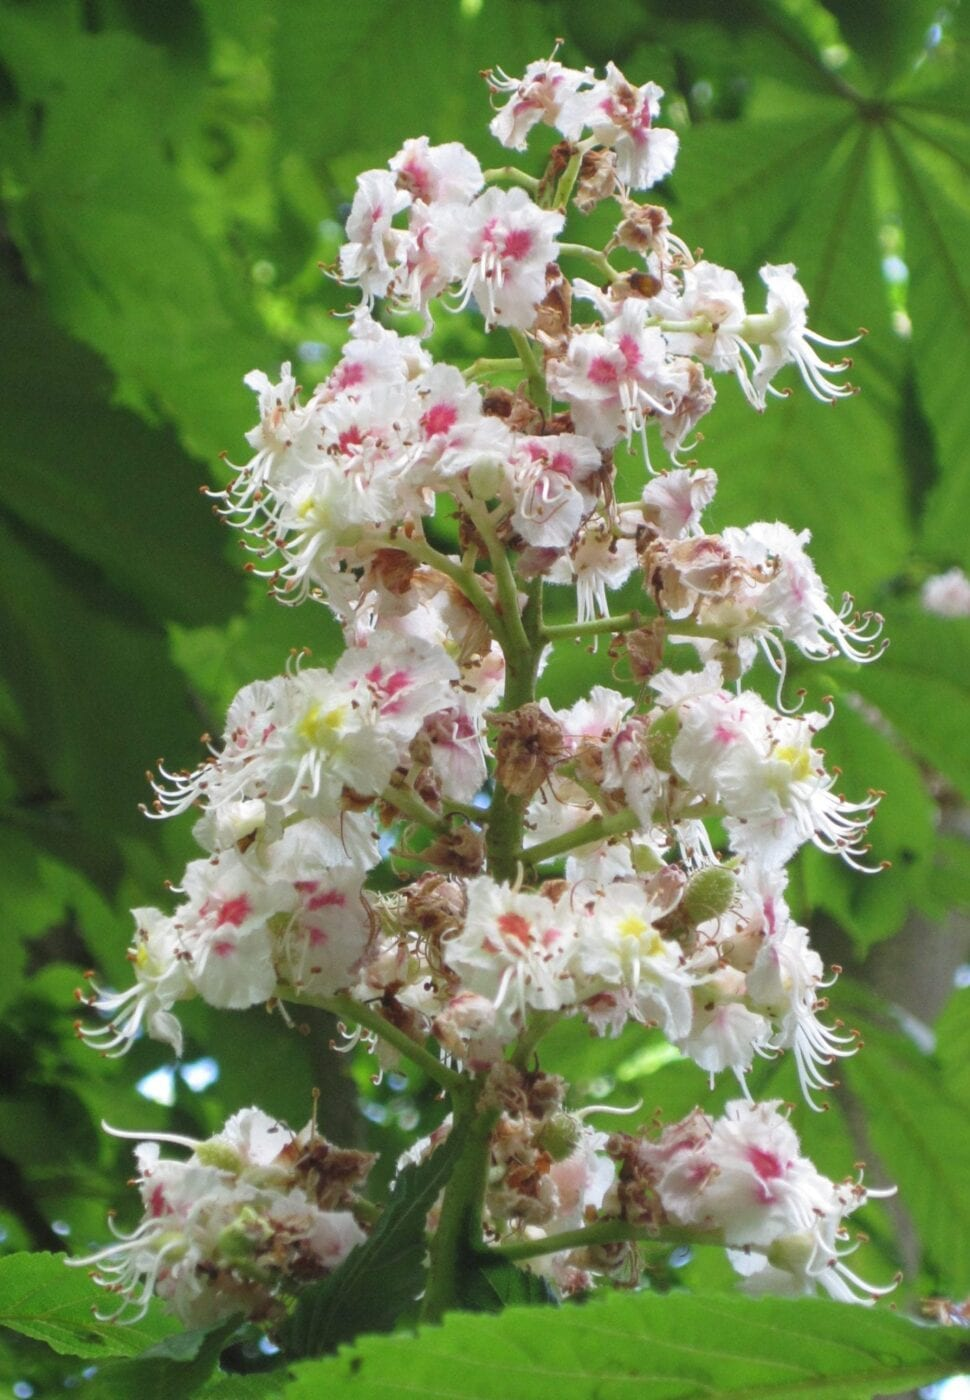 horse chestnut flower panicle